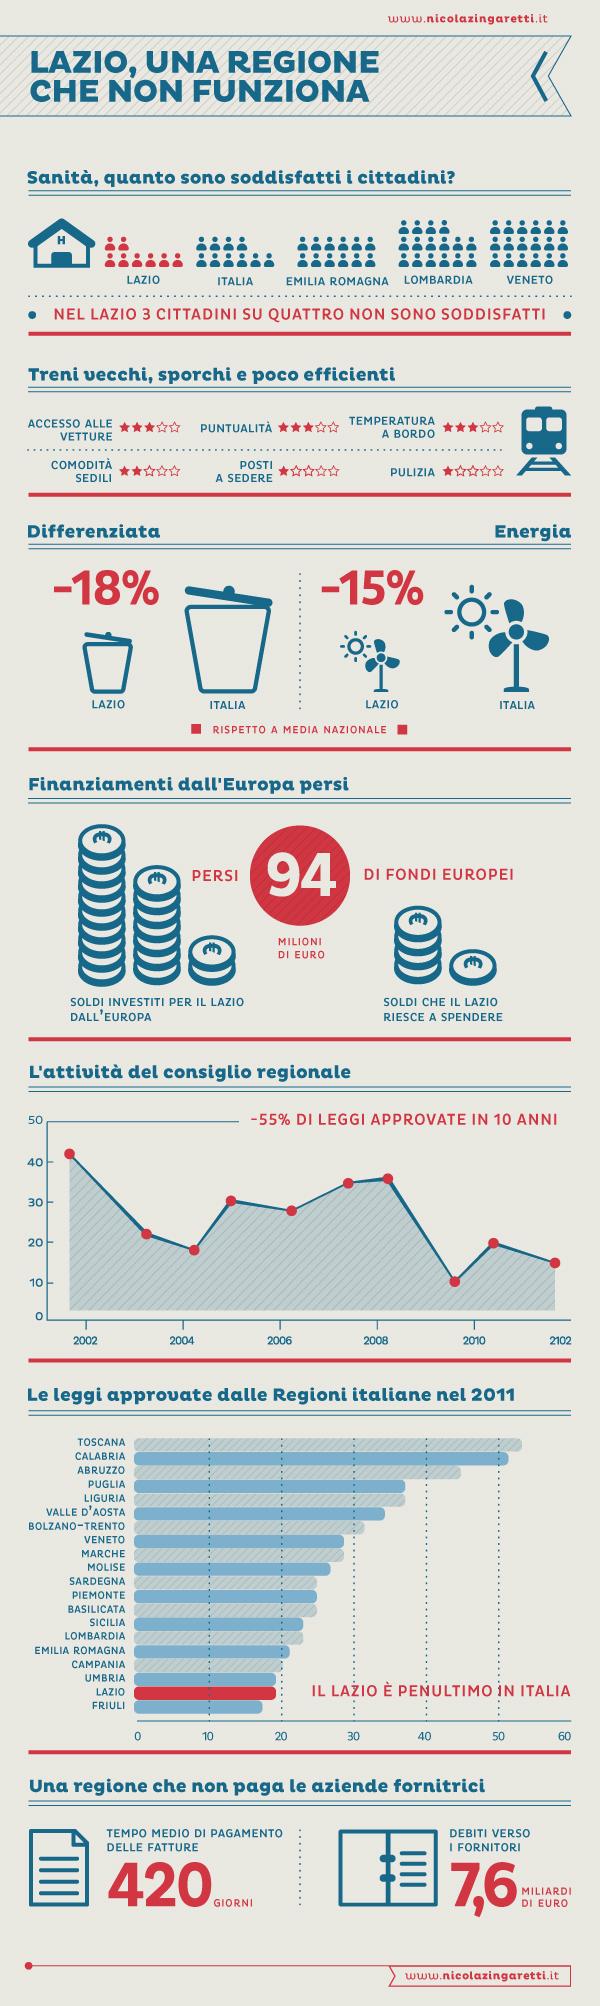 2012-11-30-infograficazingaretti.jpg